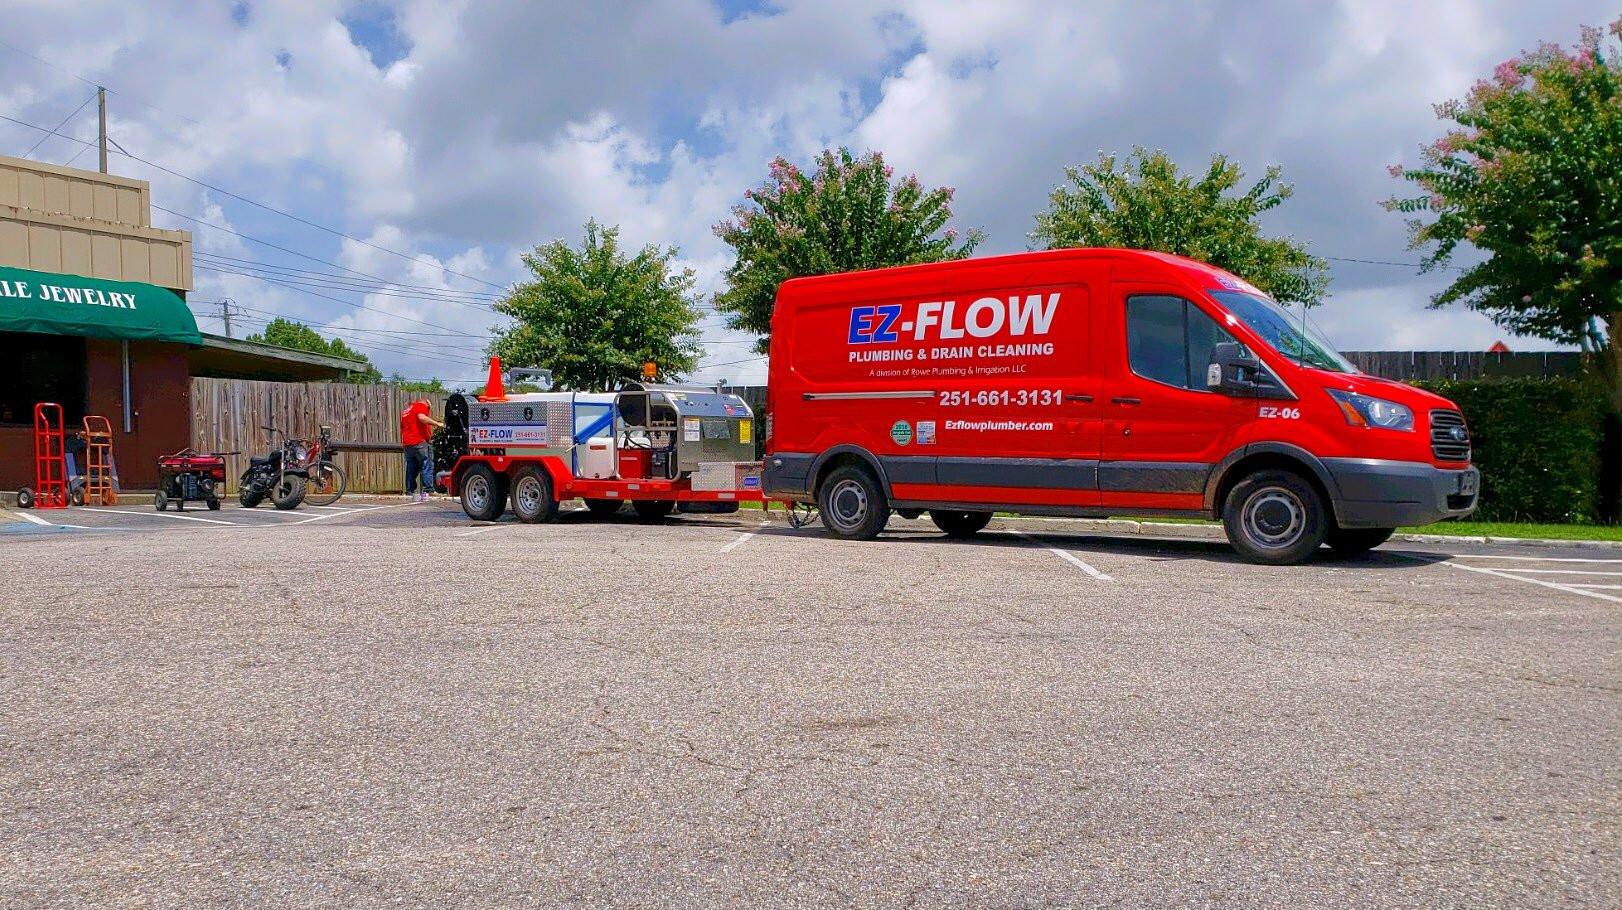 Ez Flow Plumbing Hydro Jetter Drain Cleaning